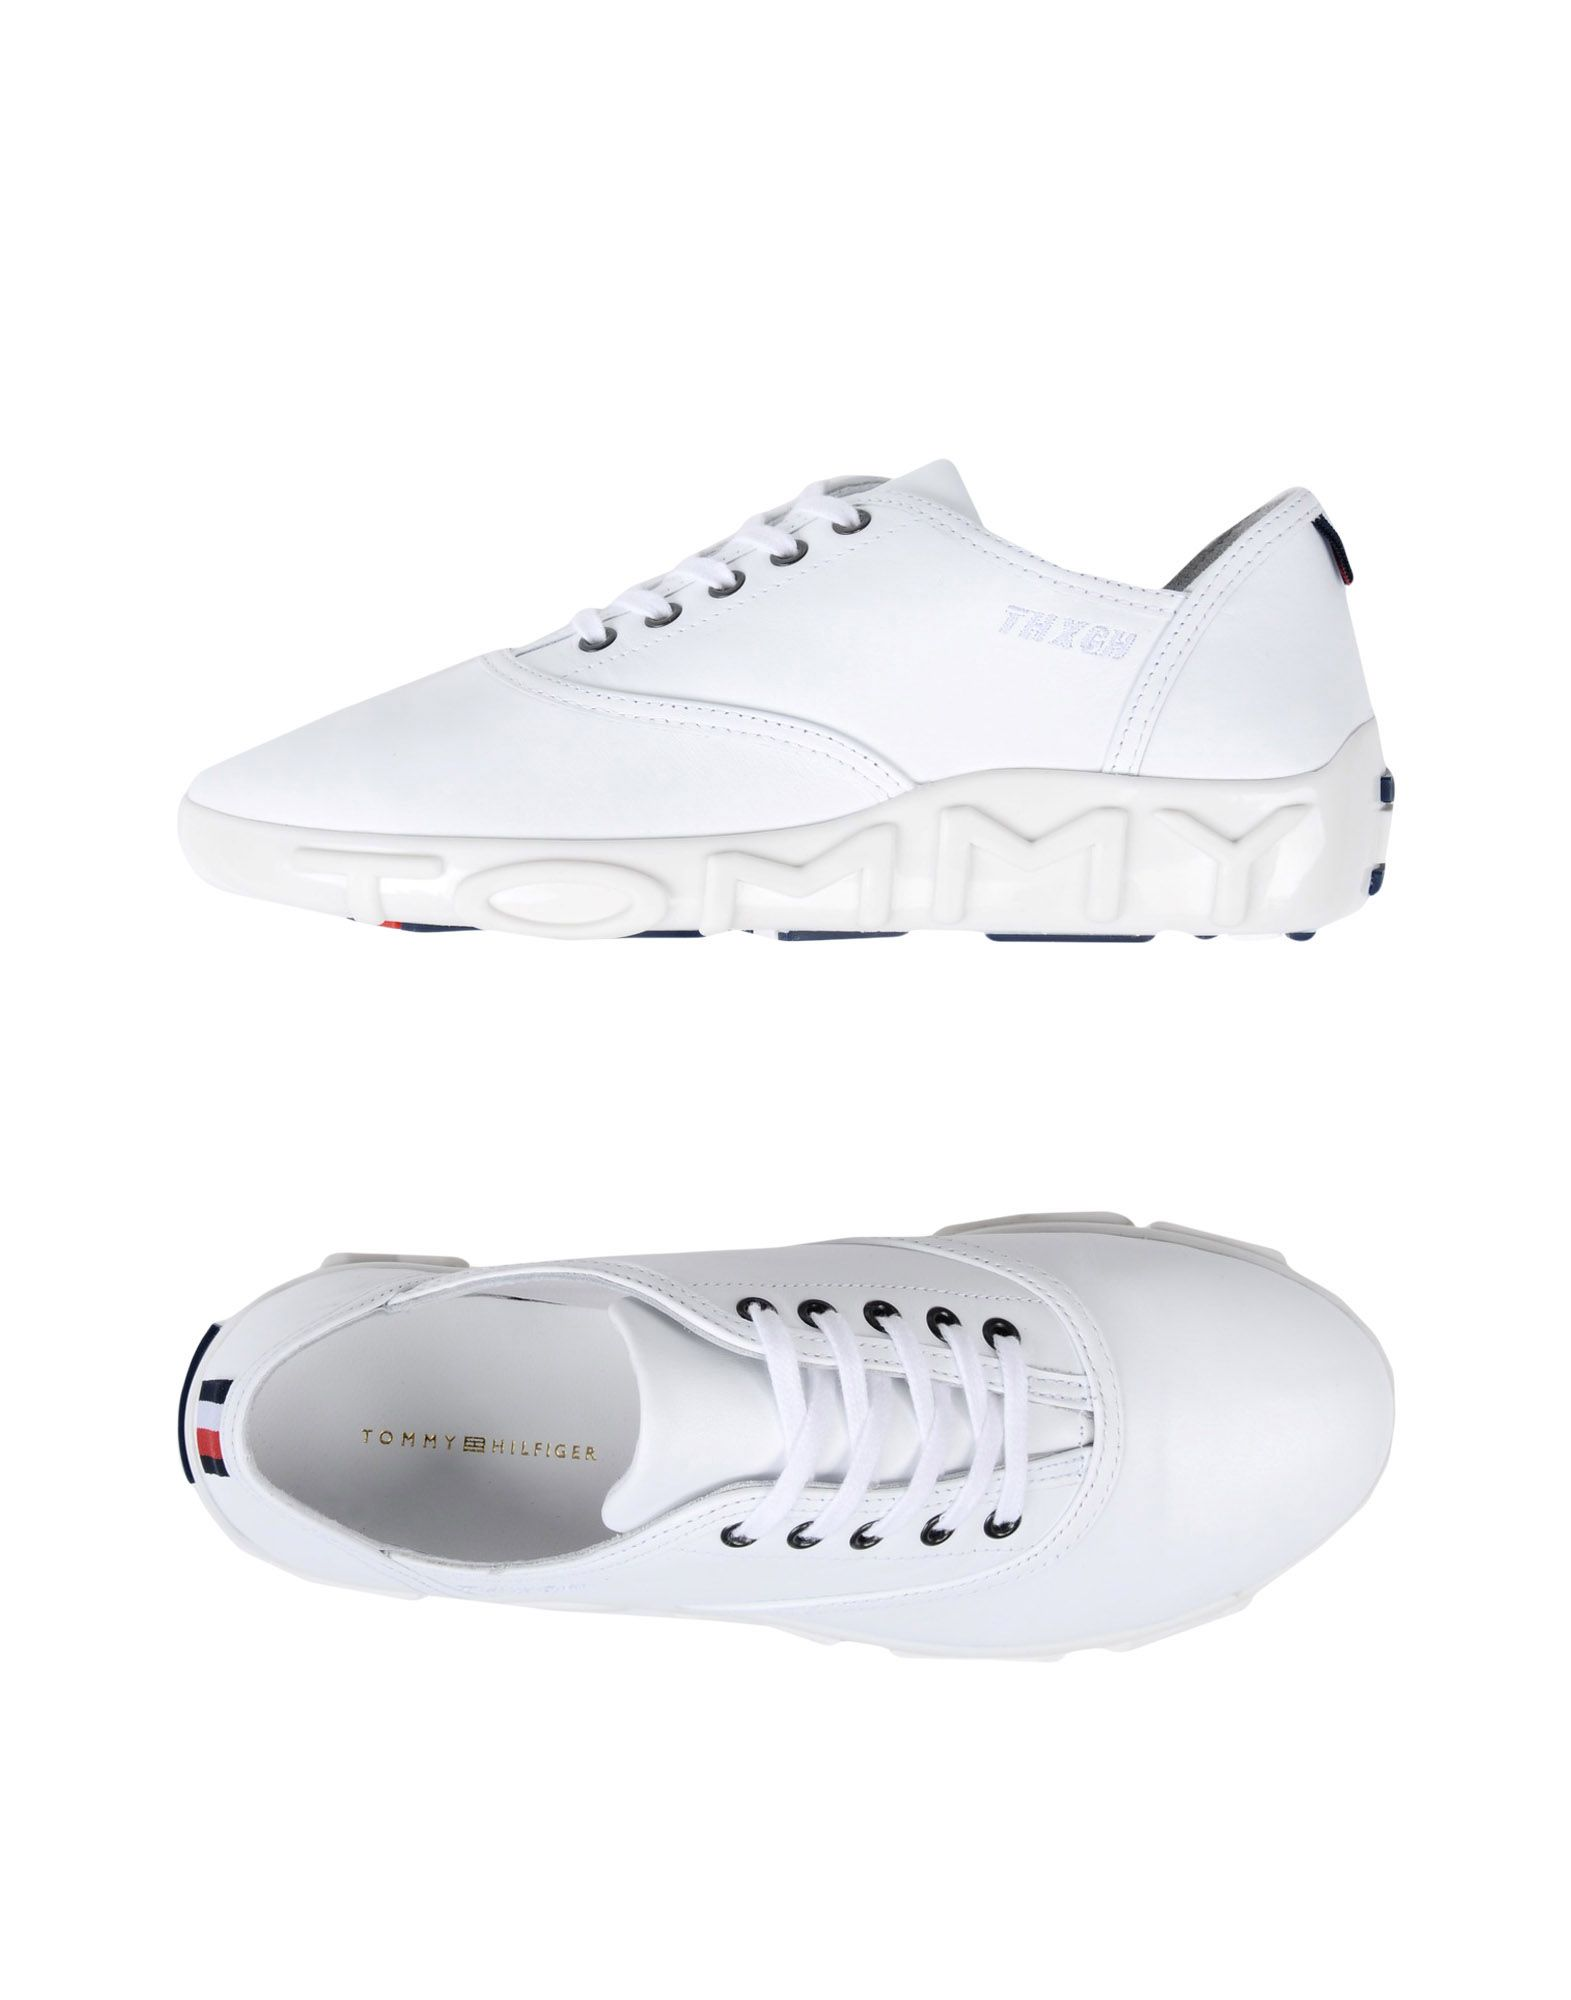 Sneakers Gigi Hadid X Tommy Hilfiger Gigi Hadid Sneaker - Donna - 11447880BI